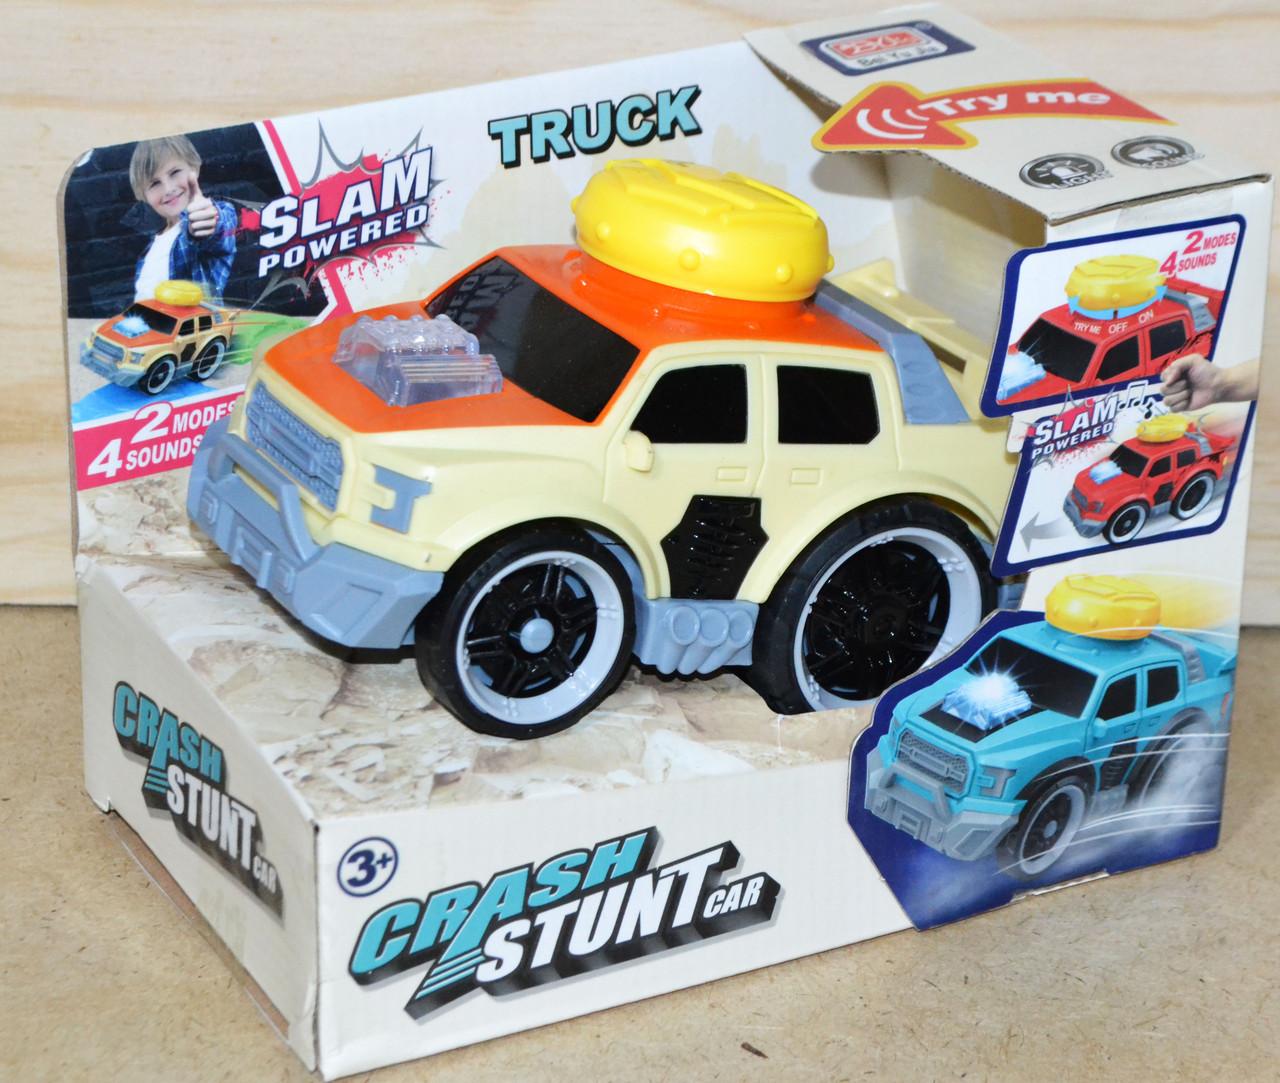 A2233-1 Машина Crash stunt Car на батарейках муз/свет 18*13